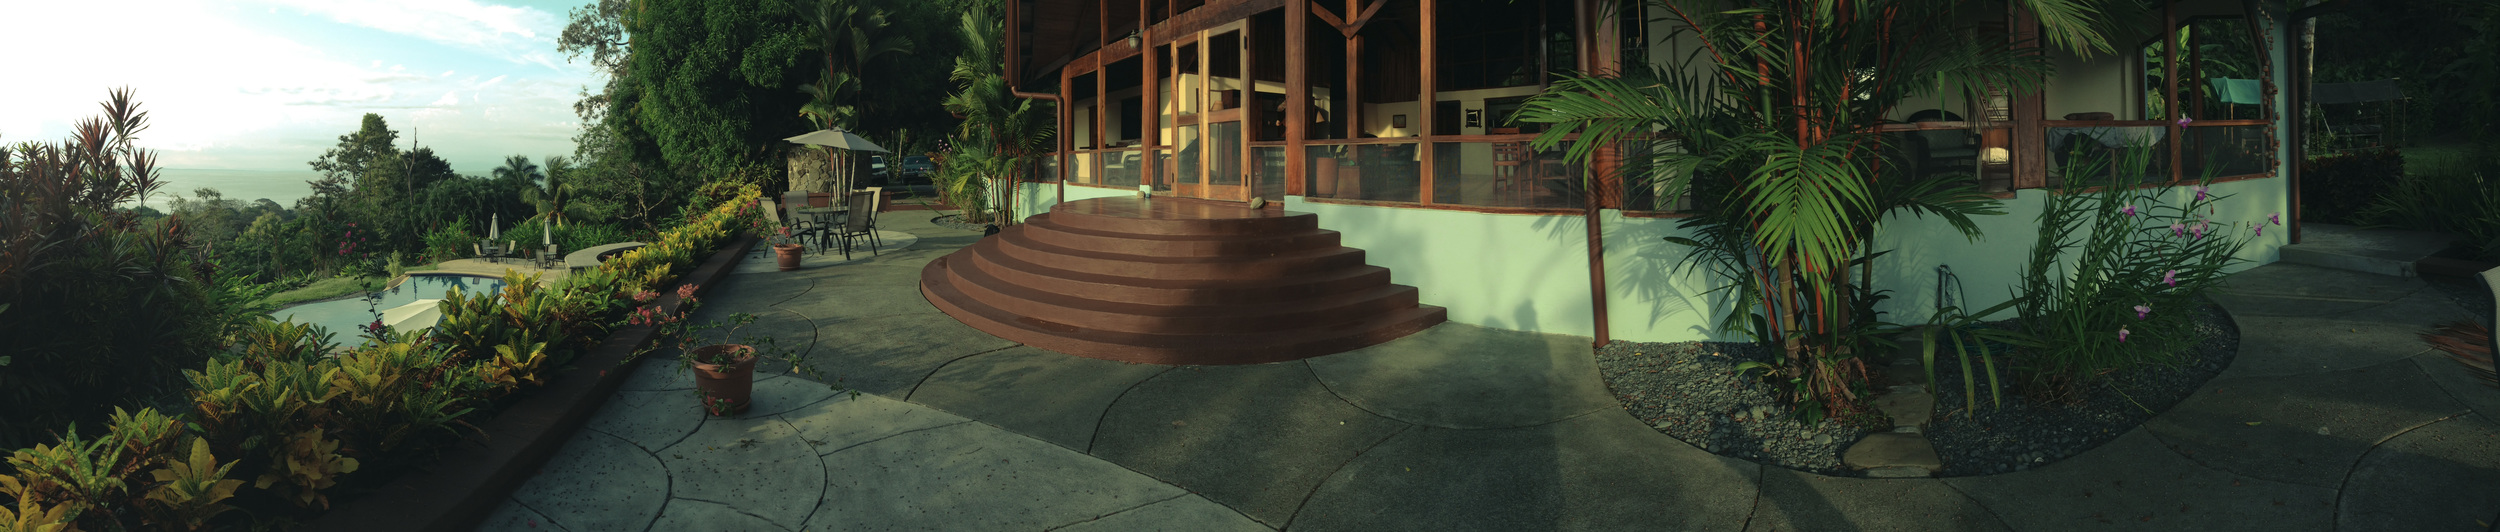 Casa Domingo1.jpg